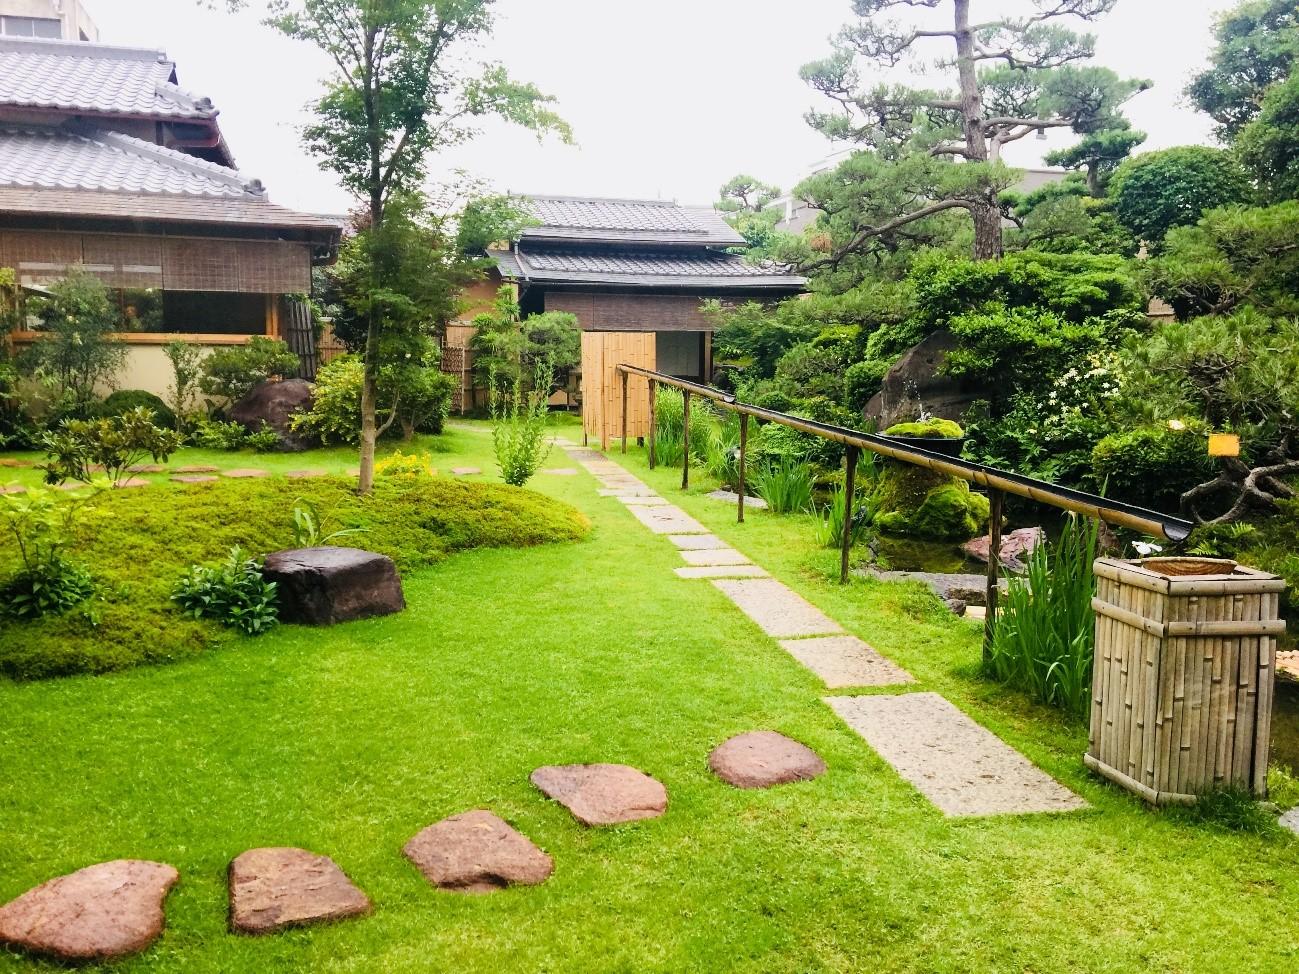 Lunch at Seiwasou (Fushimi, Kyoto)